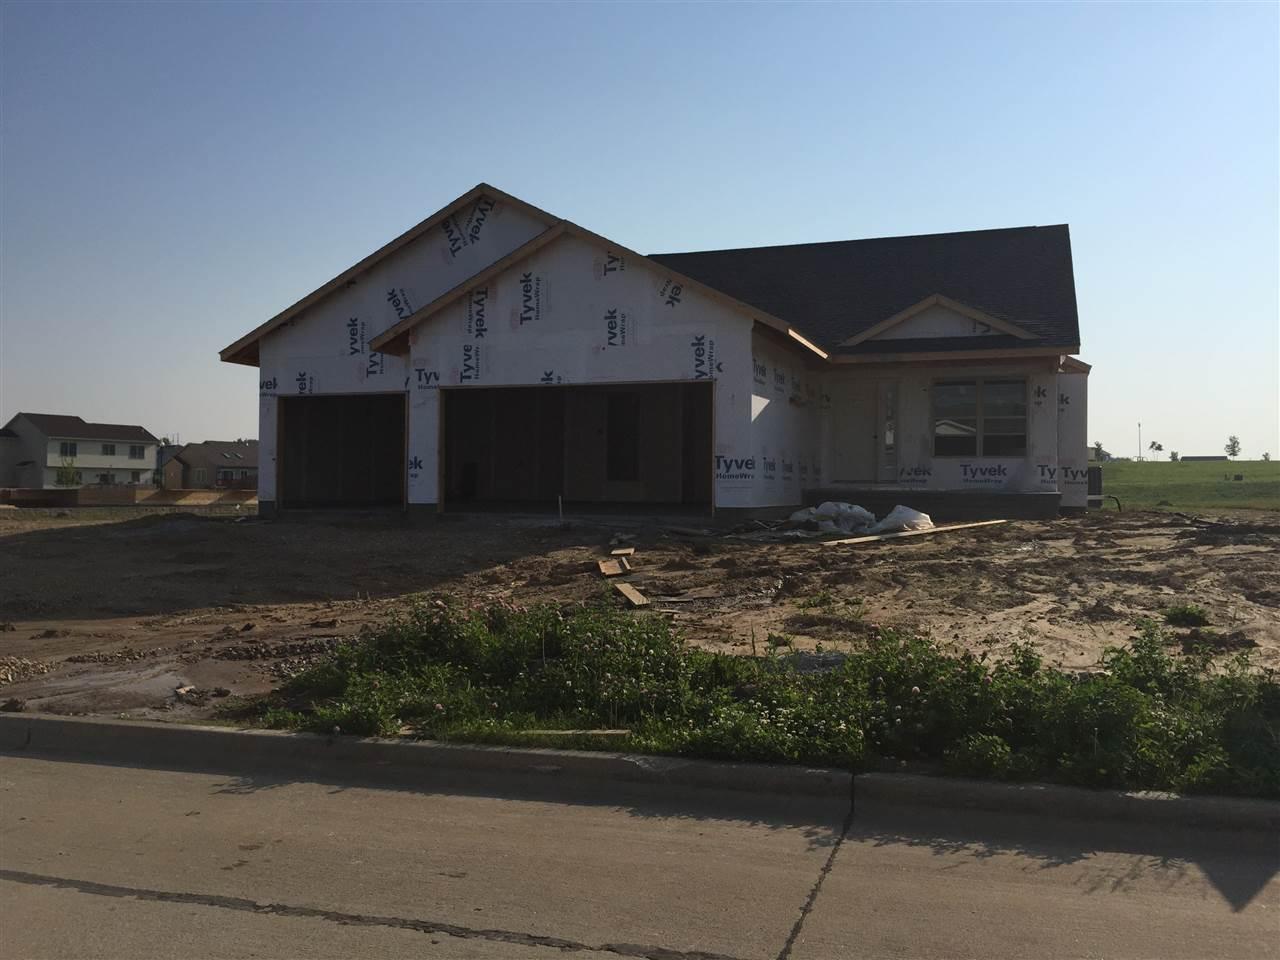 Real Estate for Sale, ListingId: 33674192, Davenport,IA52807